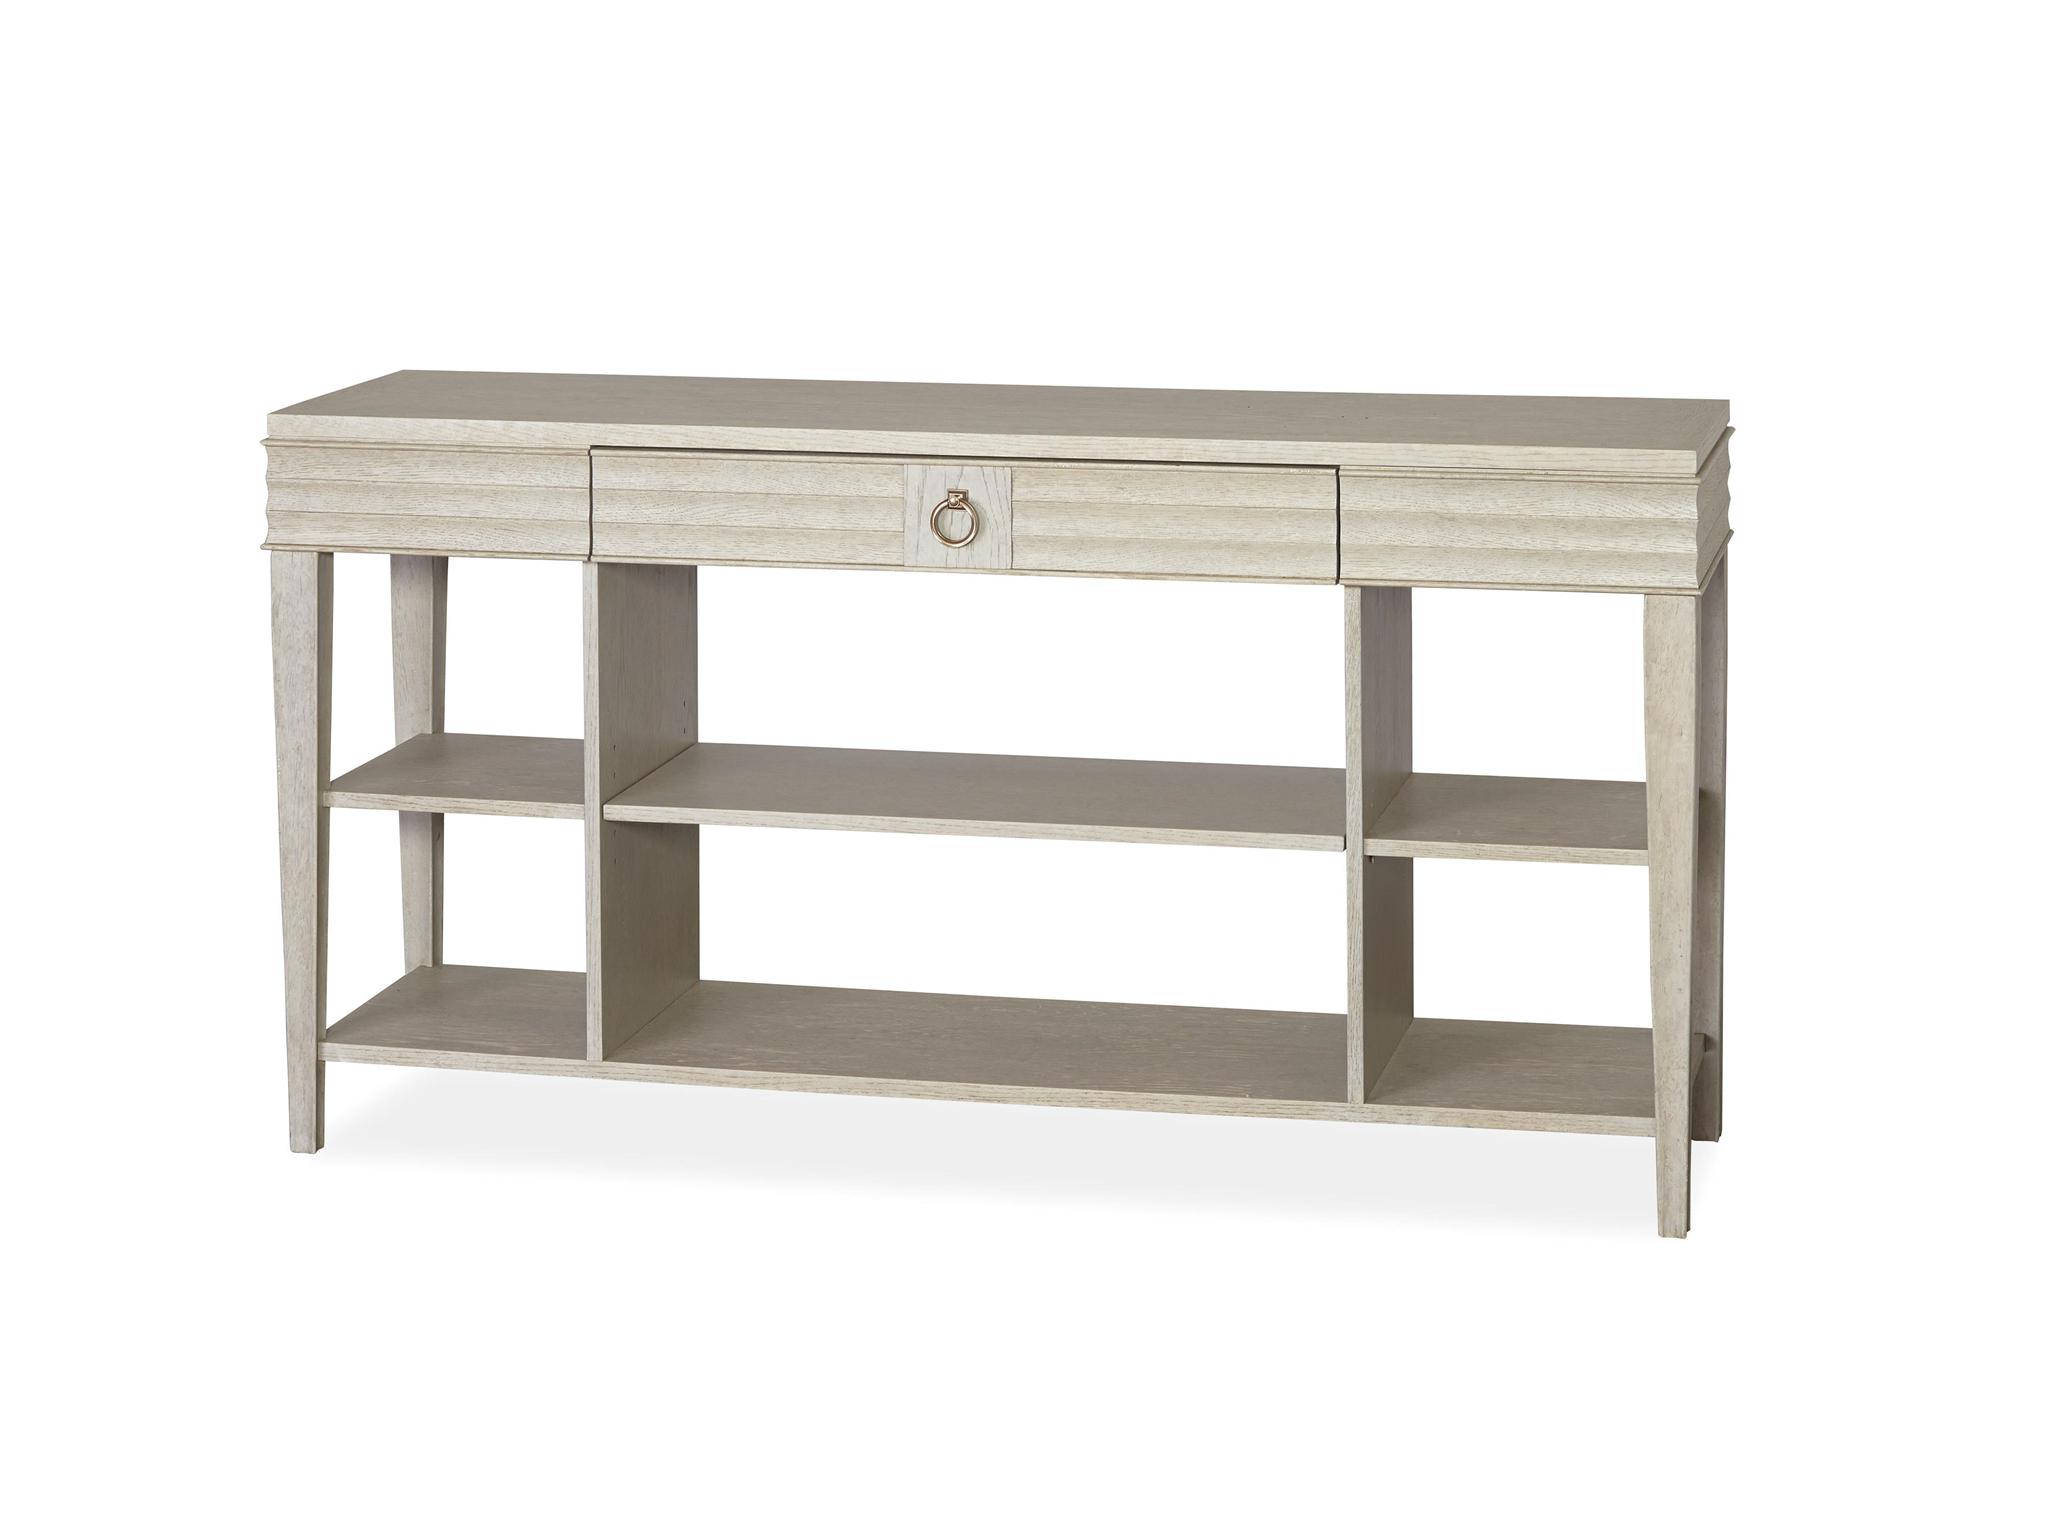 Universal Furniture | California | Console Table 63 x 17, $640